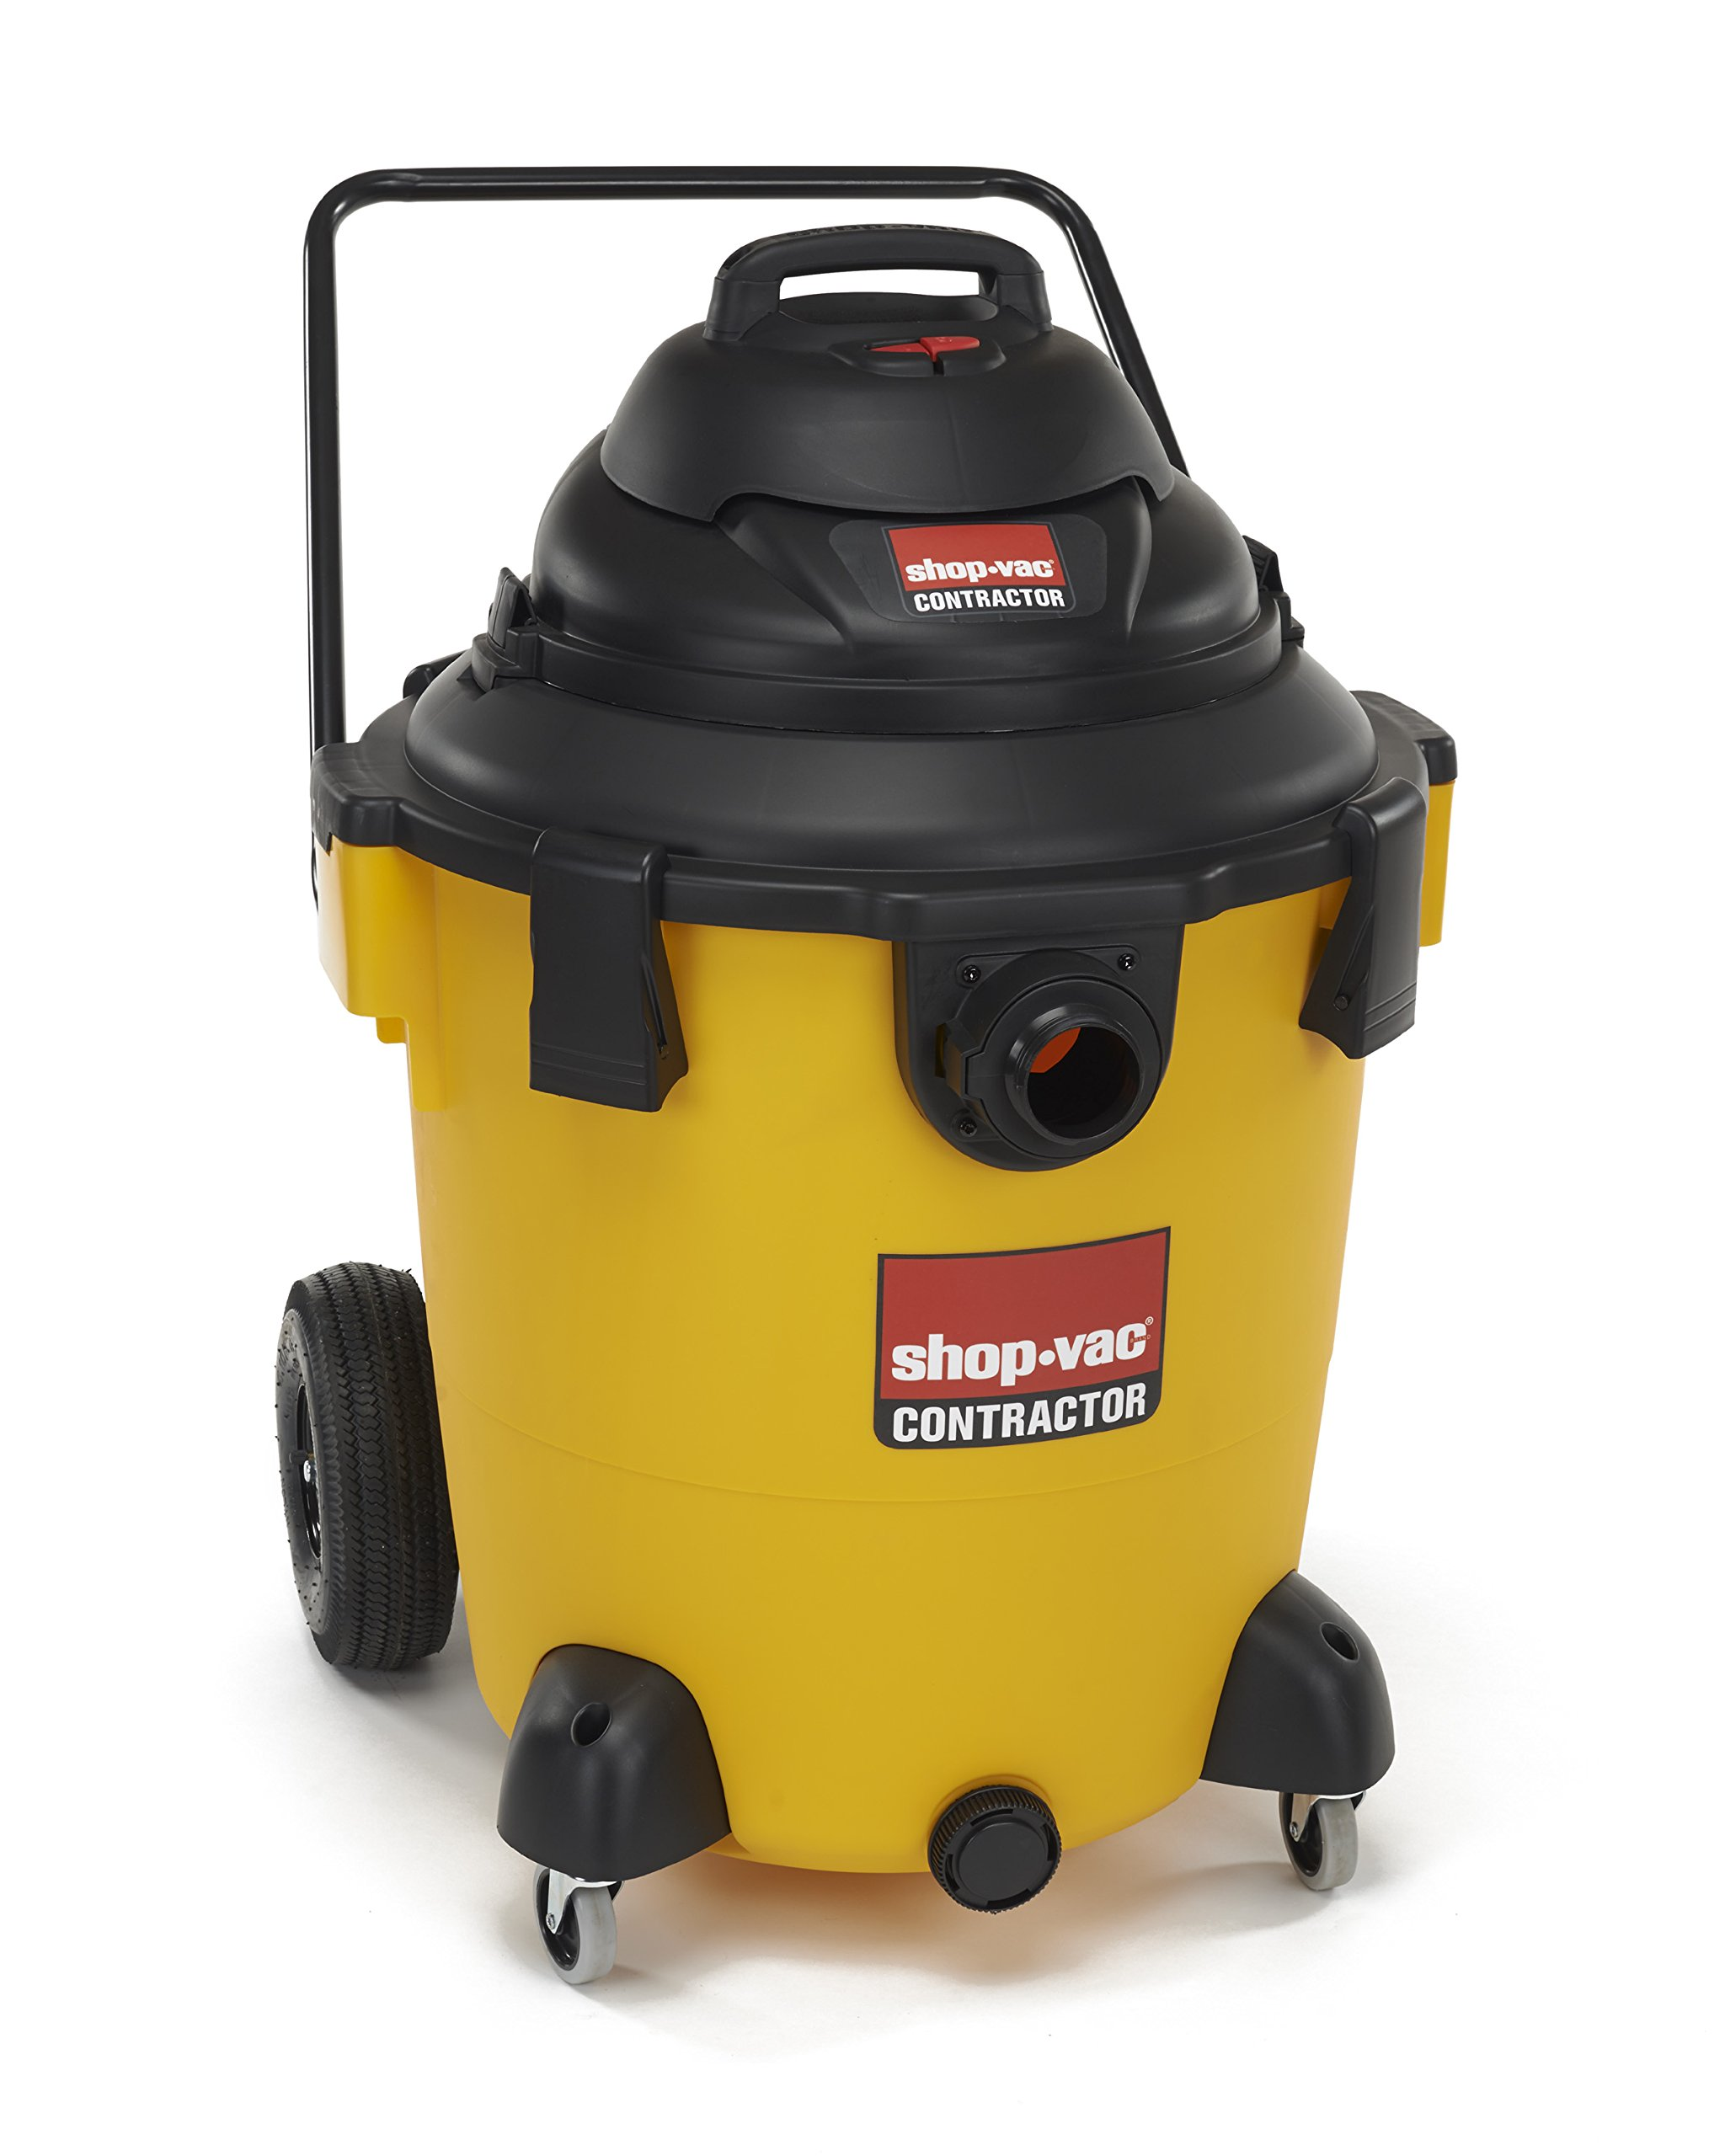 Shop-Vac 9626810 6.5 Peak HP Wet Dry Vacuum, 32-Gallon by Shop-Vac